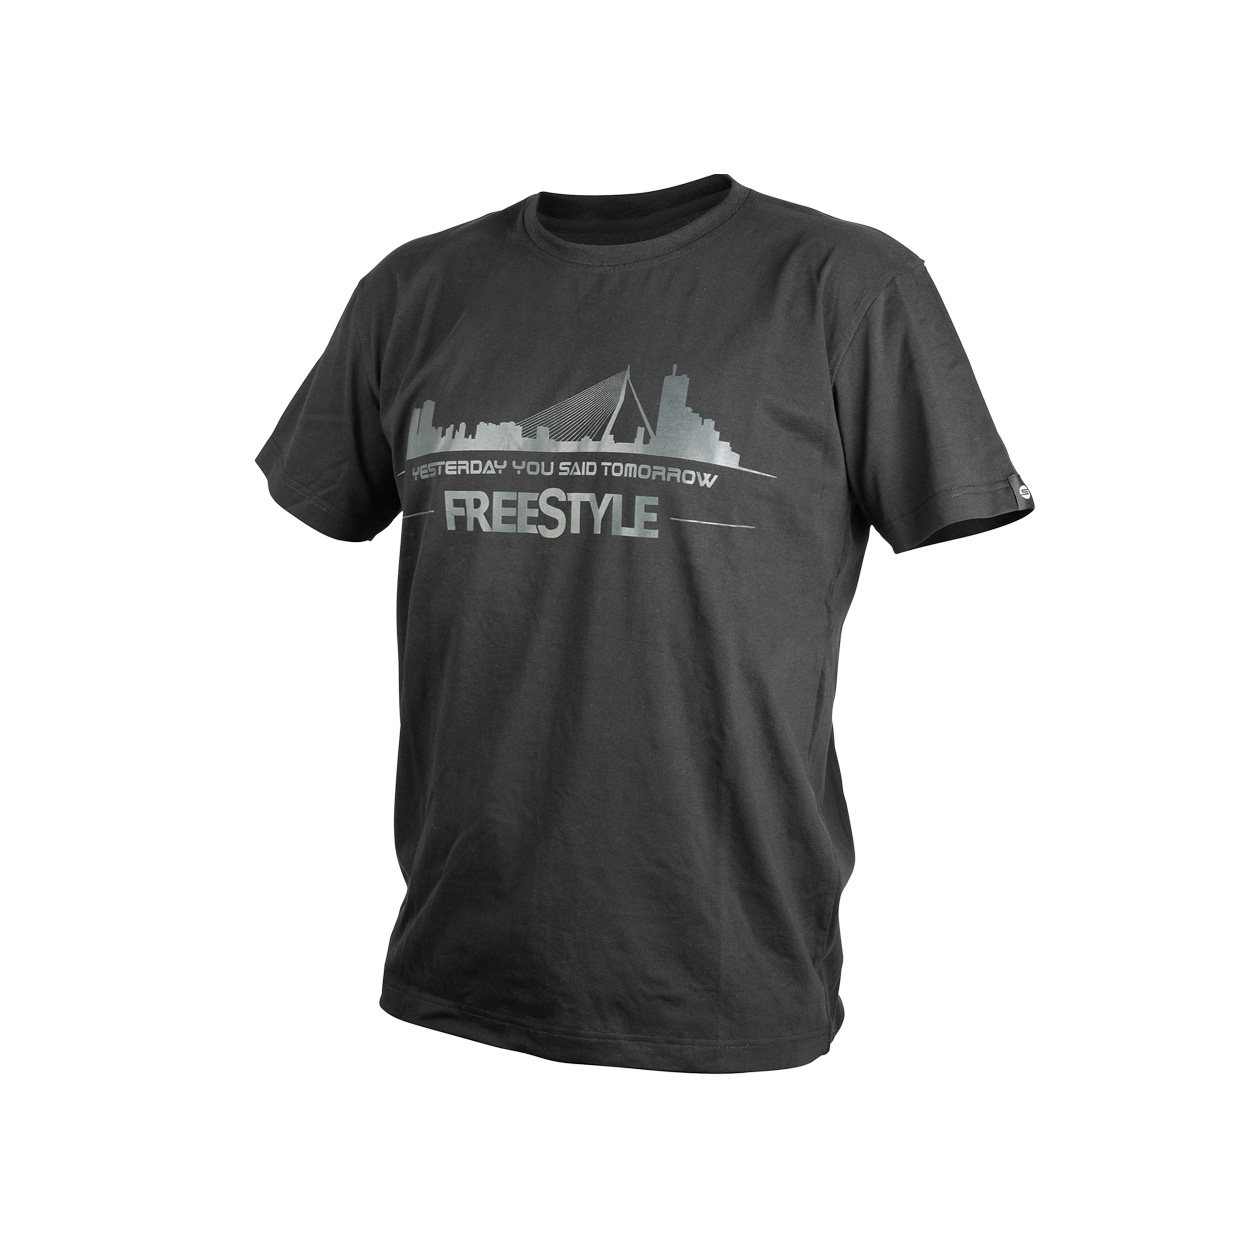 Freestyle - T-Shirt - Black 01